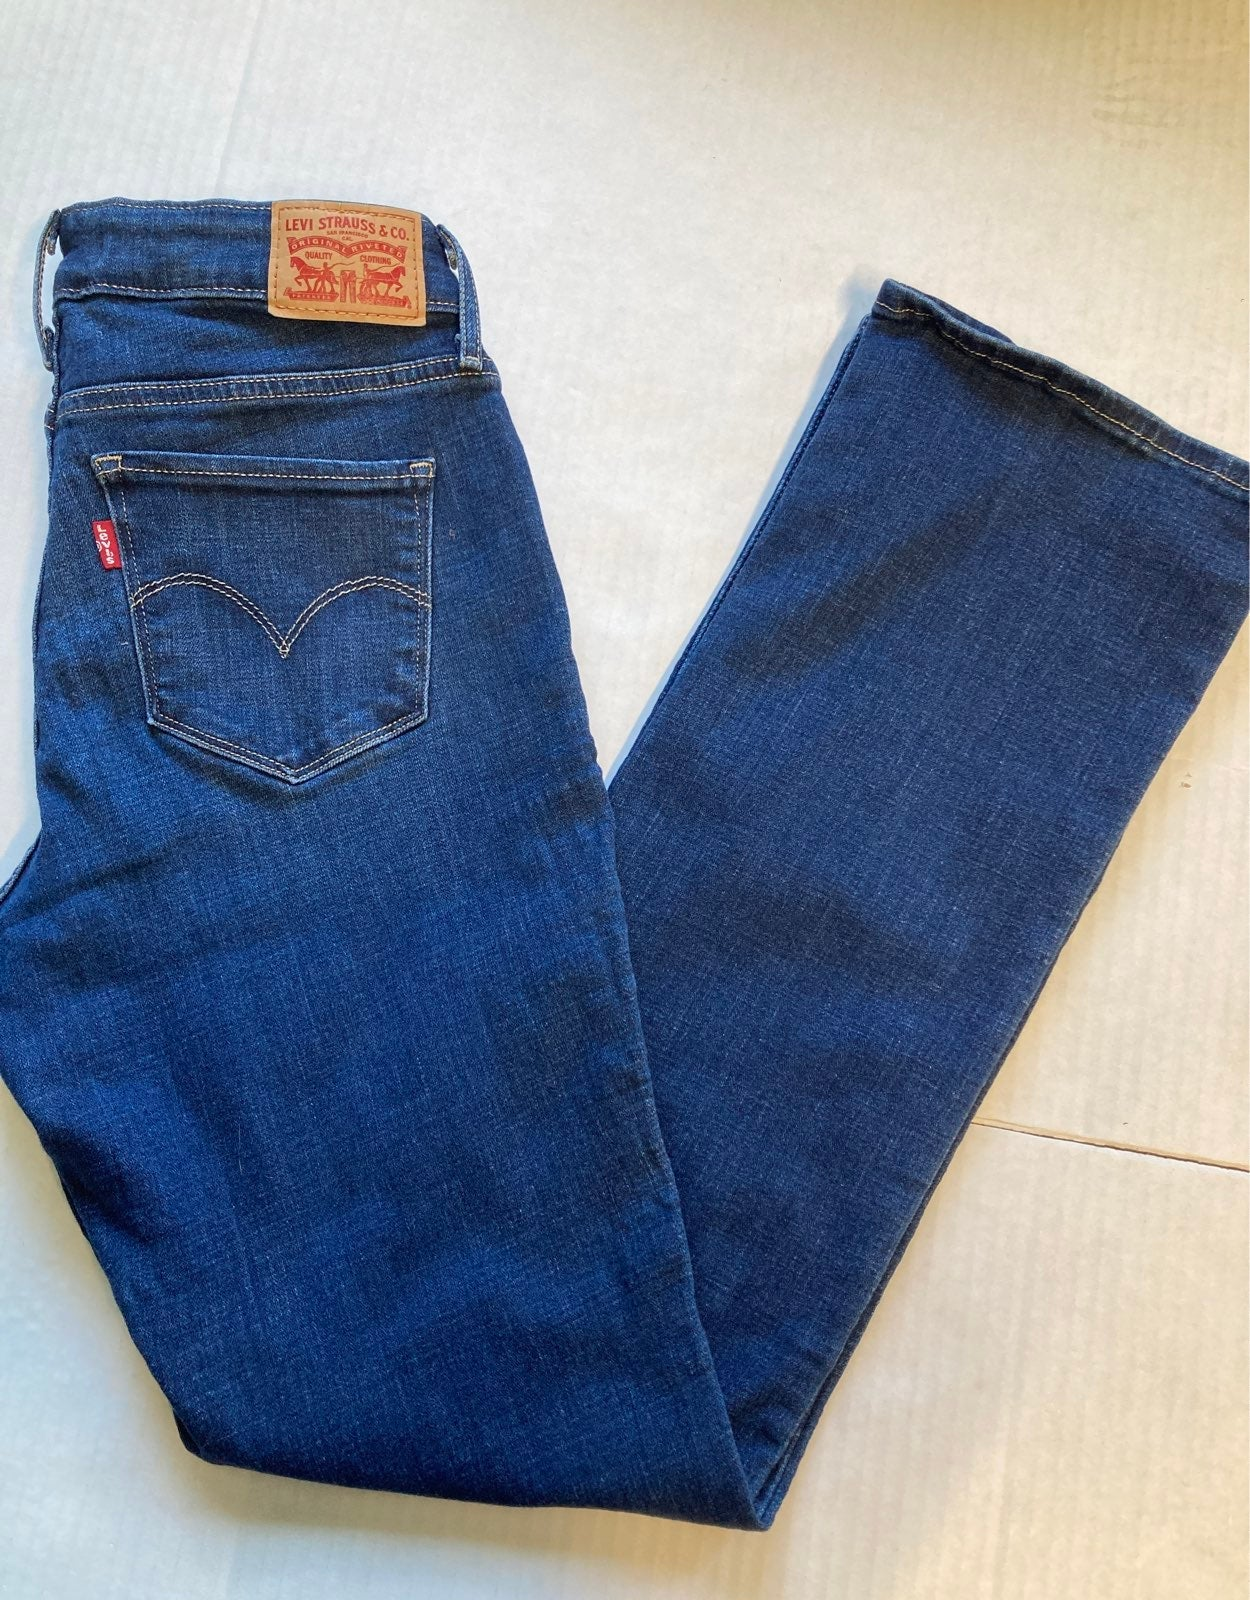 Levi's 815 Curvy Bootcut Jeans 28